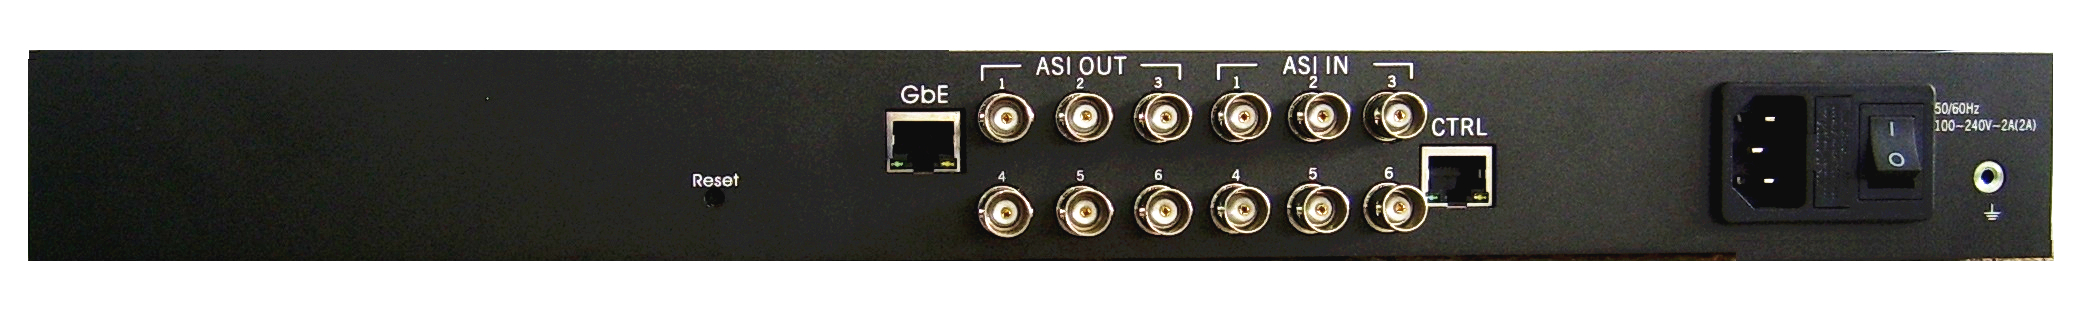 MK766 后面板.JPG